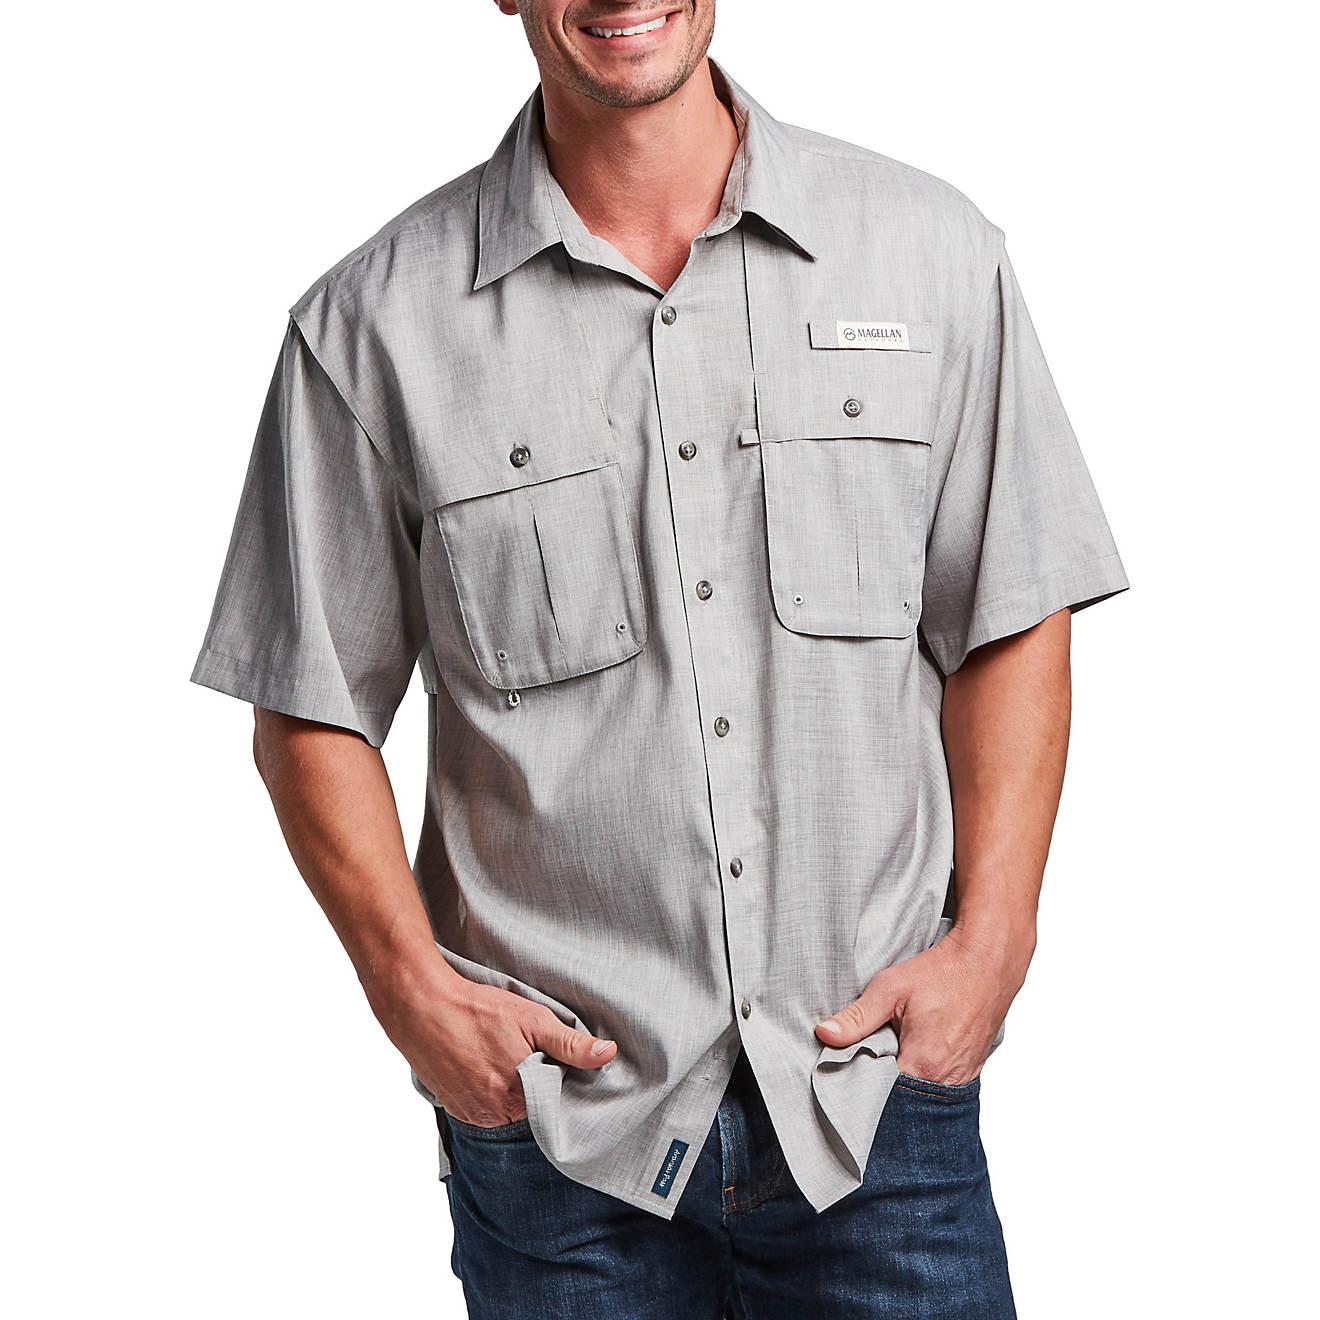 .97 Magellan Outdoors Men's Aransas Pass Heather Short Sleeve Fishing Shirt at Academy!